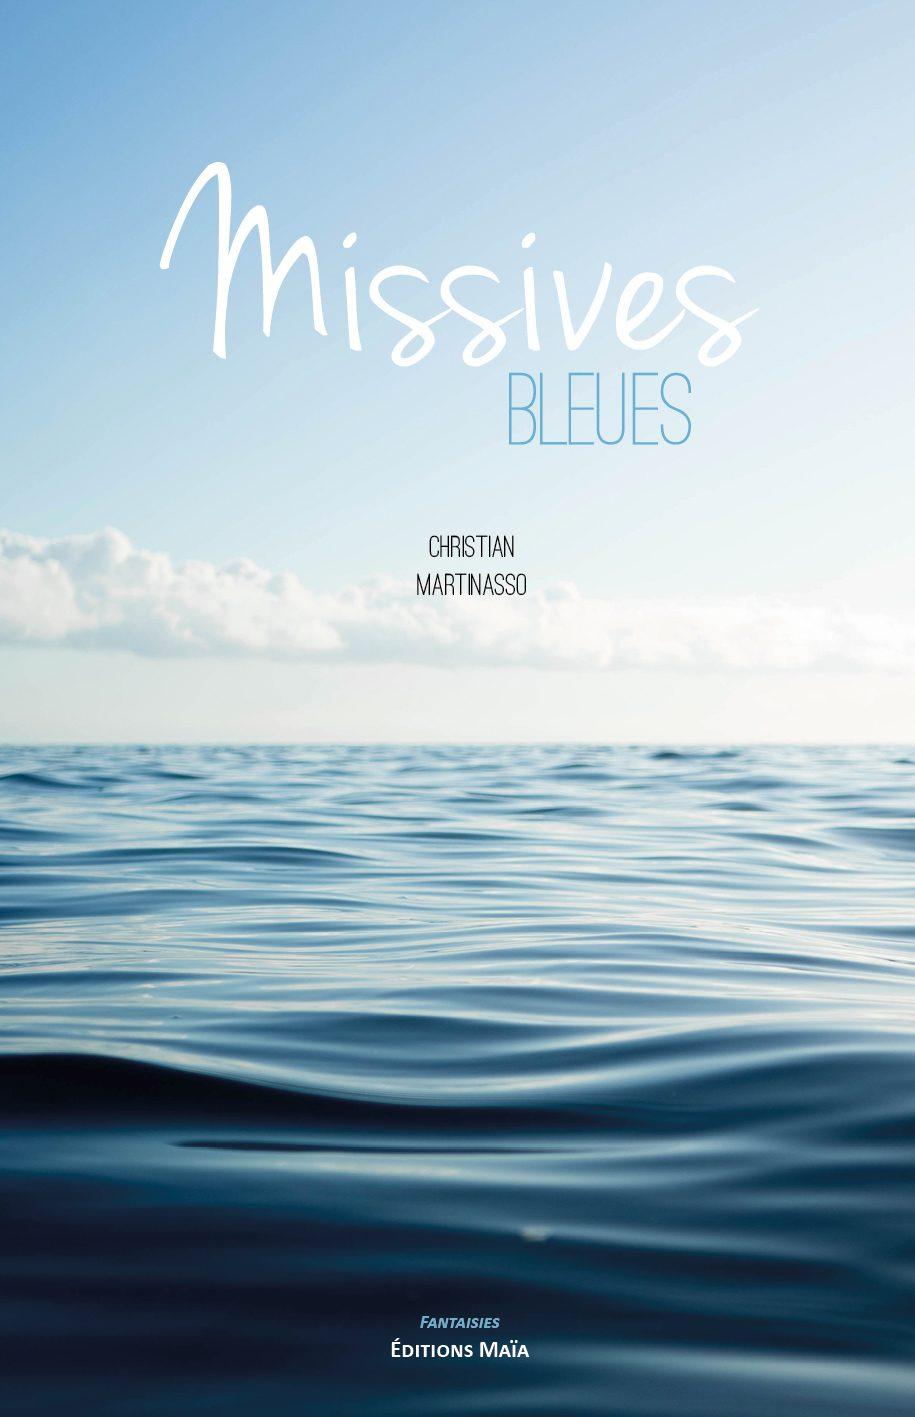 Entretien avec Christian Martinasso – Missives bleues